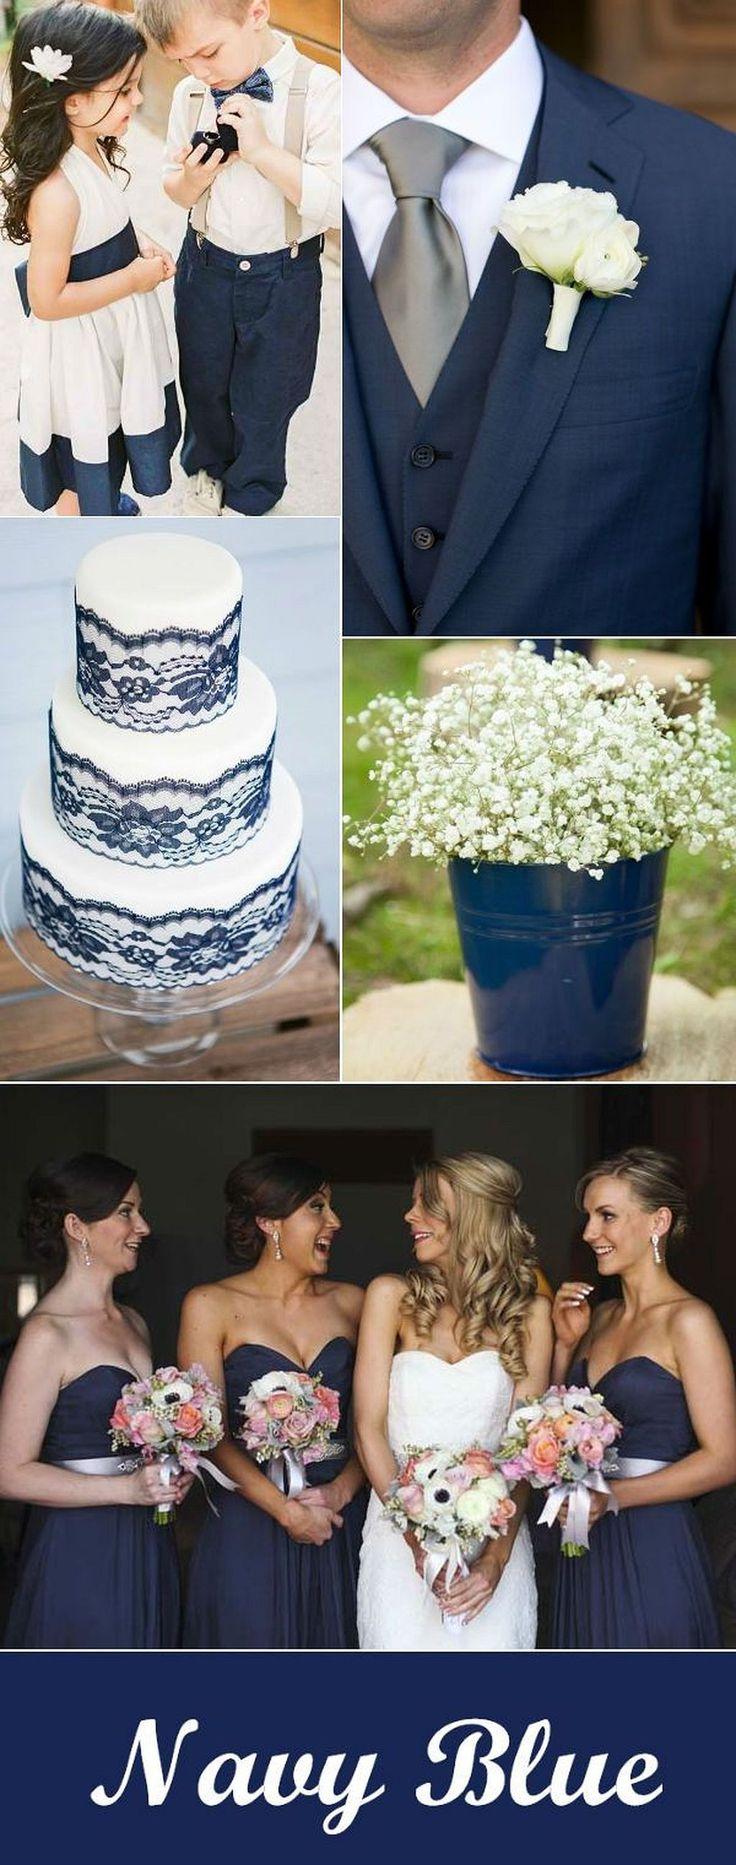 25 best ideas about Navy blue weddings on Pinterest